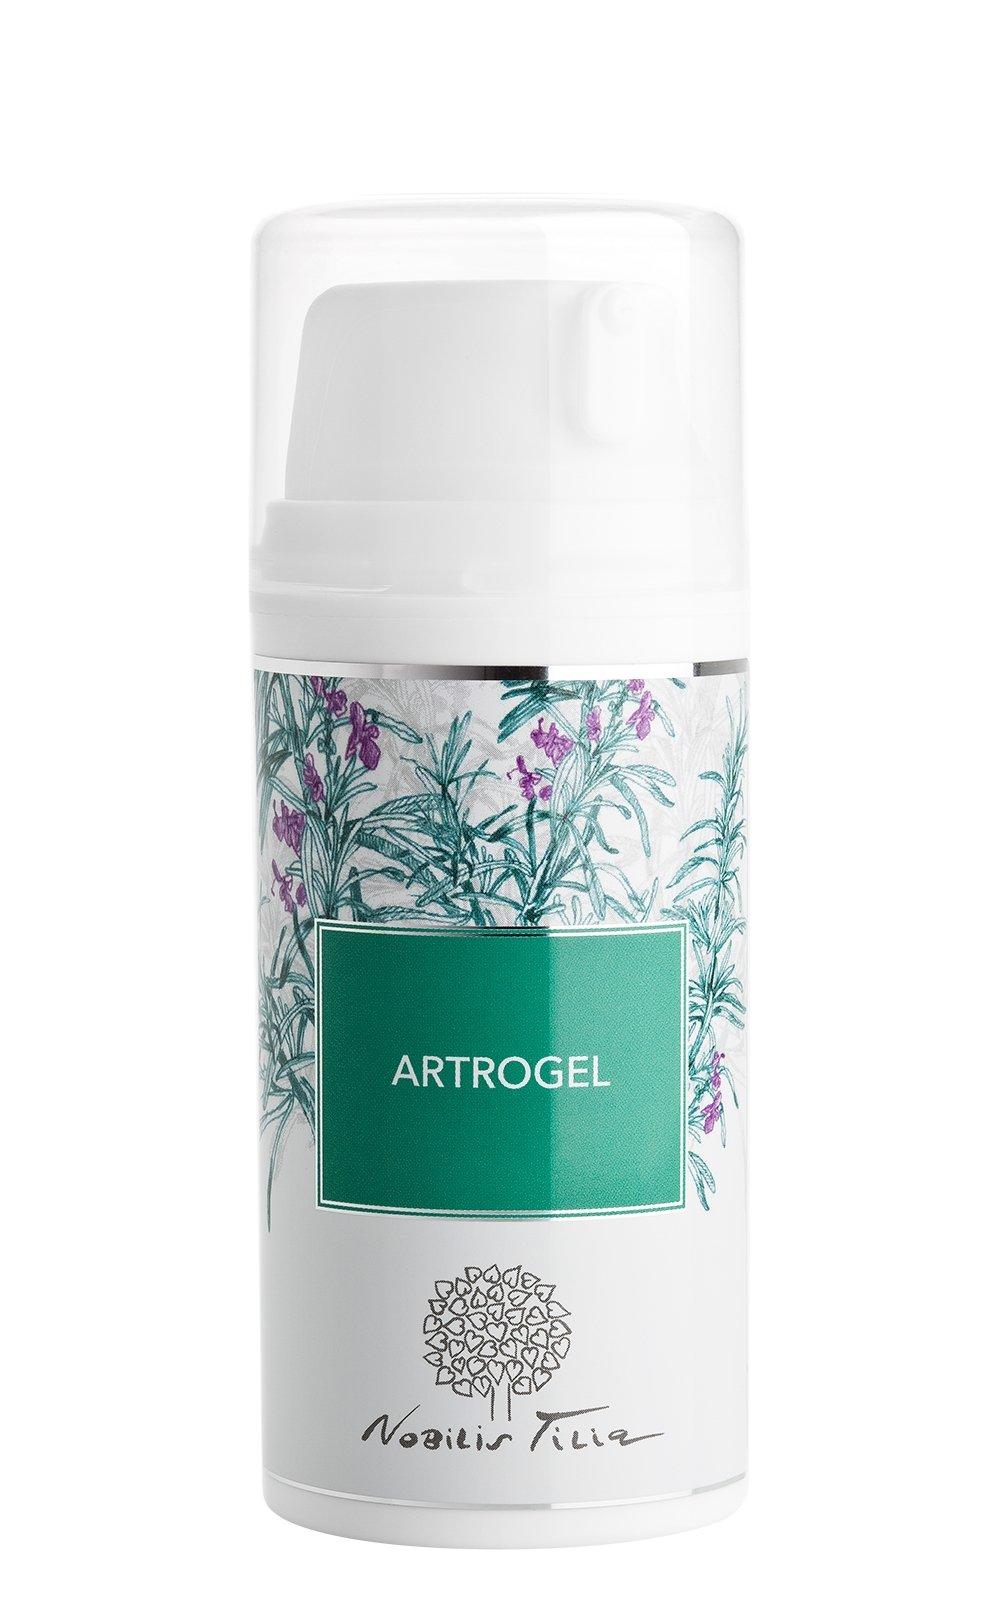 Artrogel